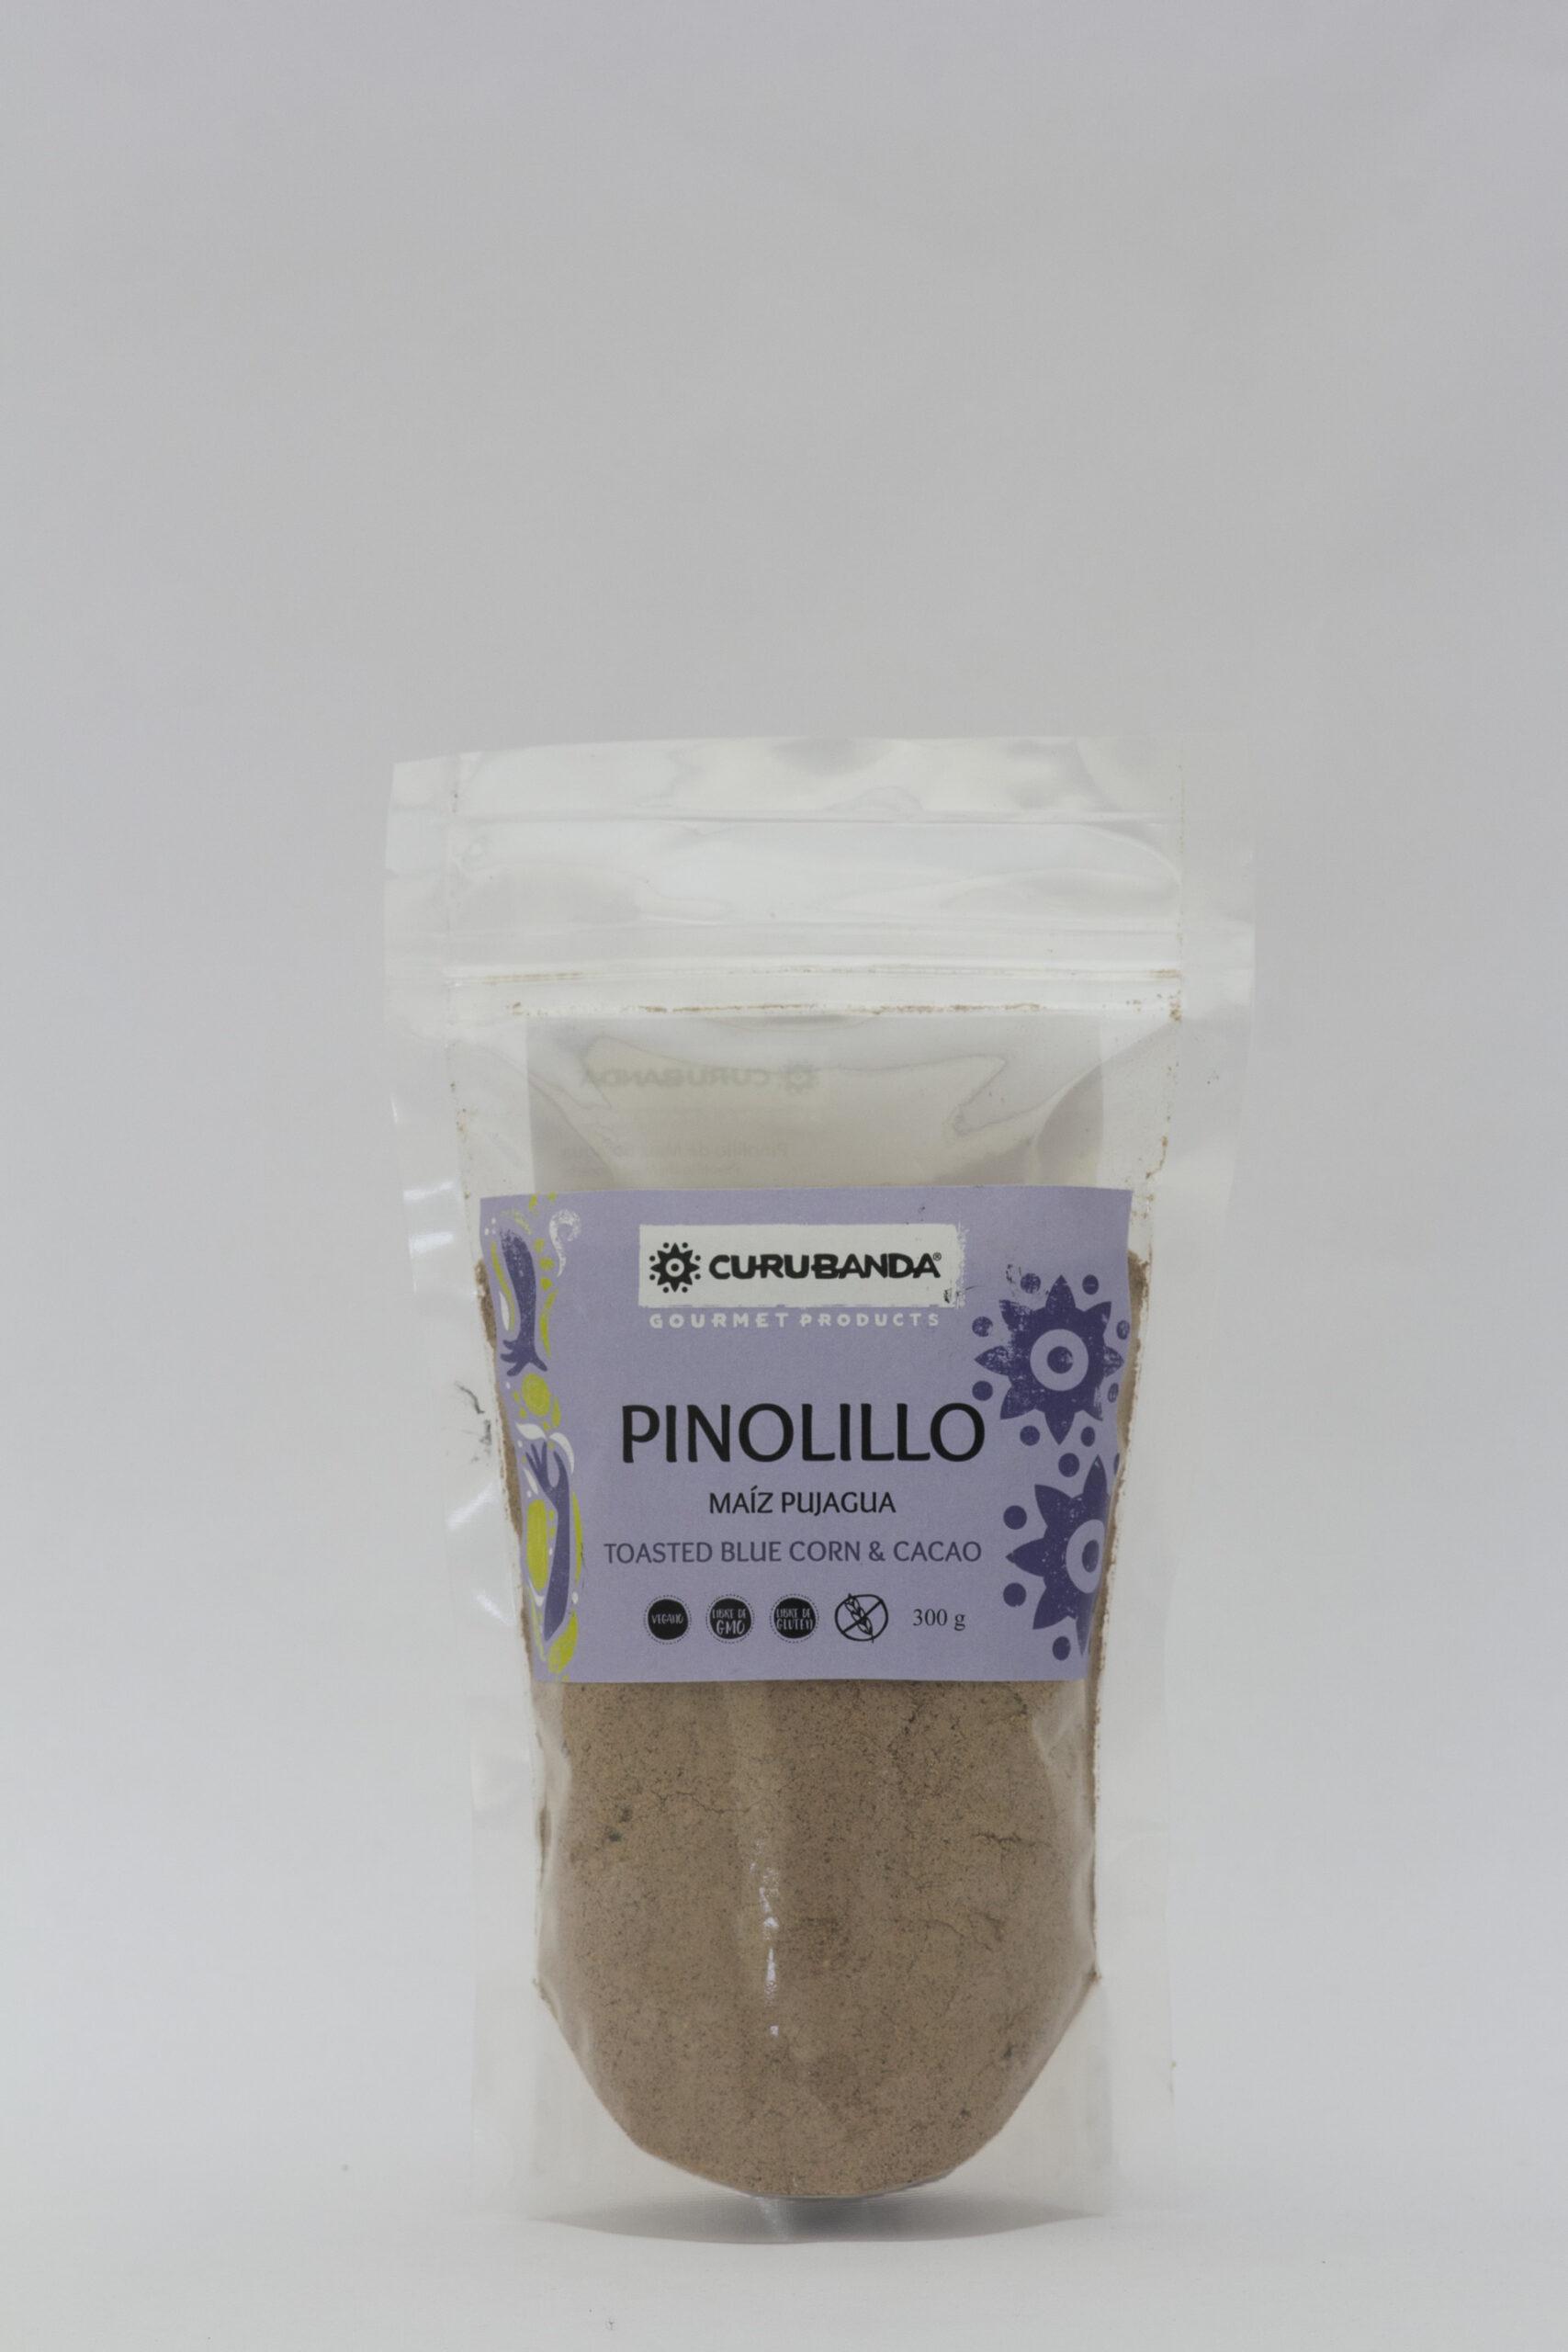 Pinolillo de Maíz Pujagua